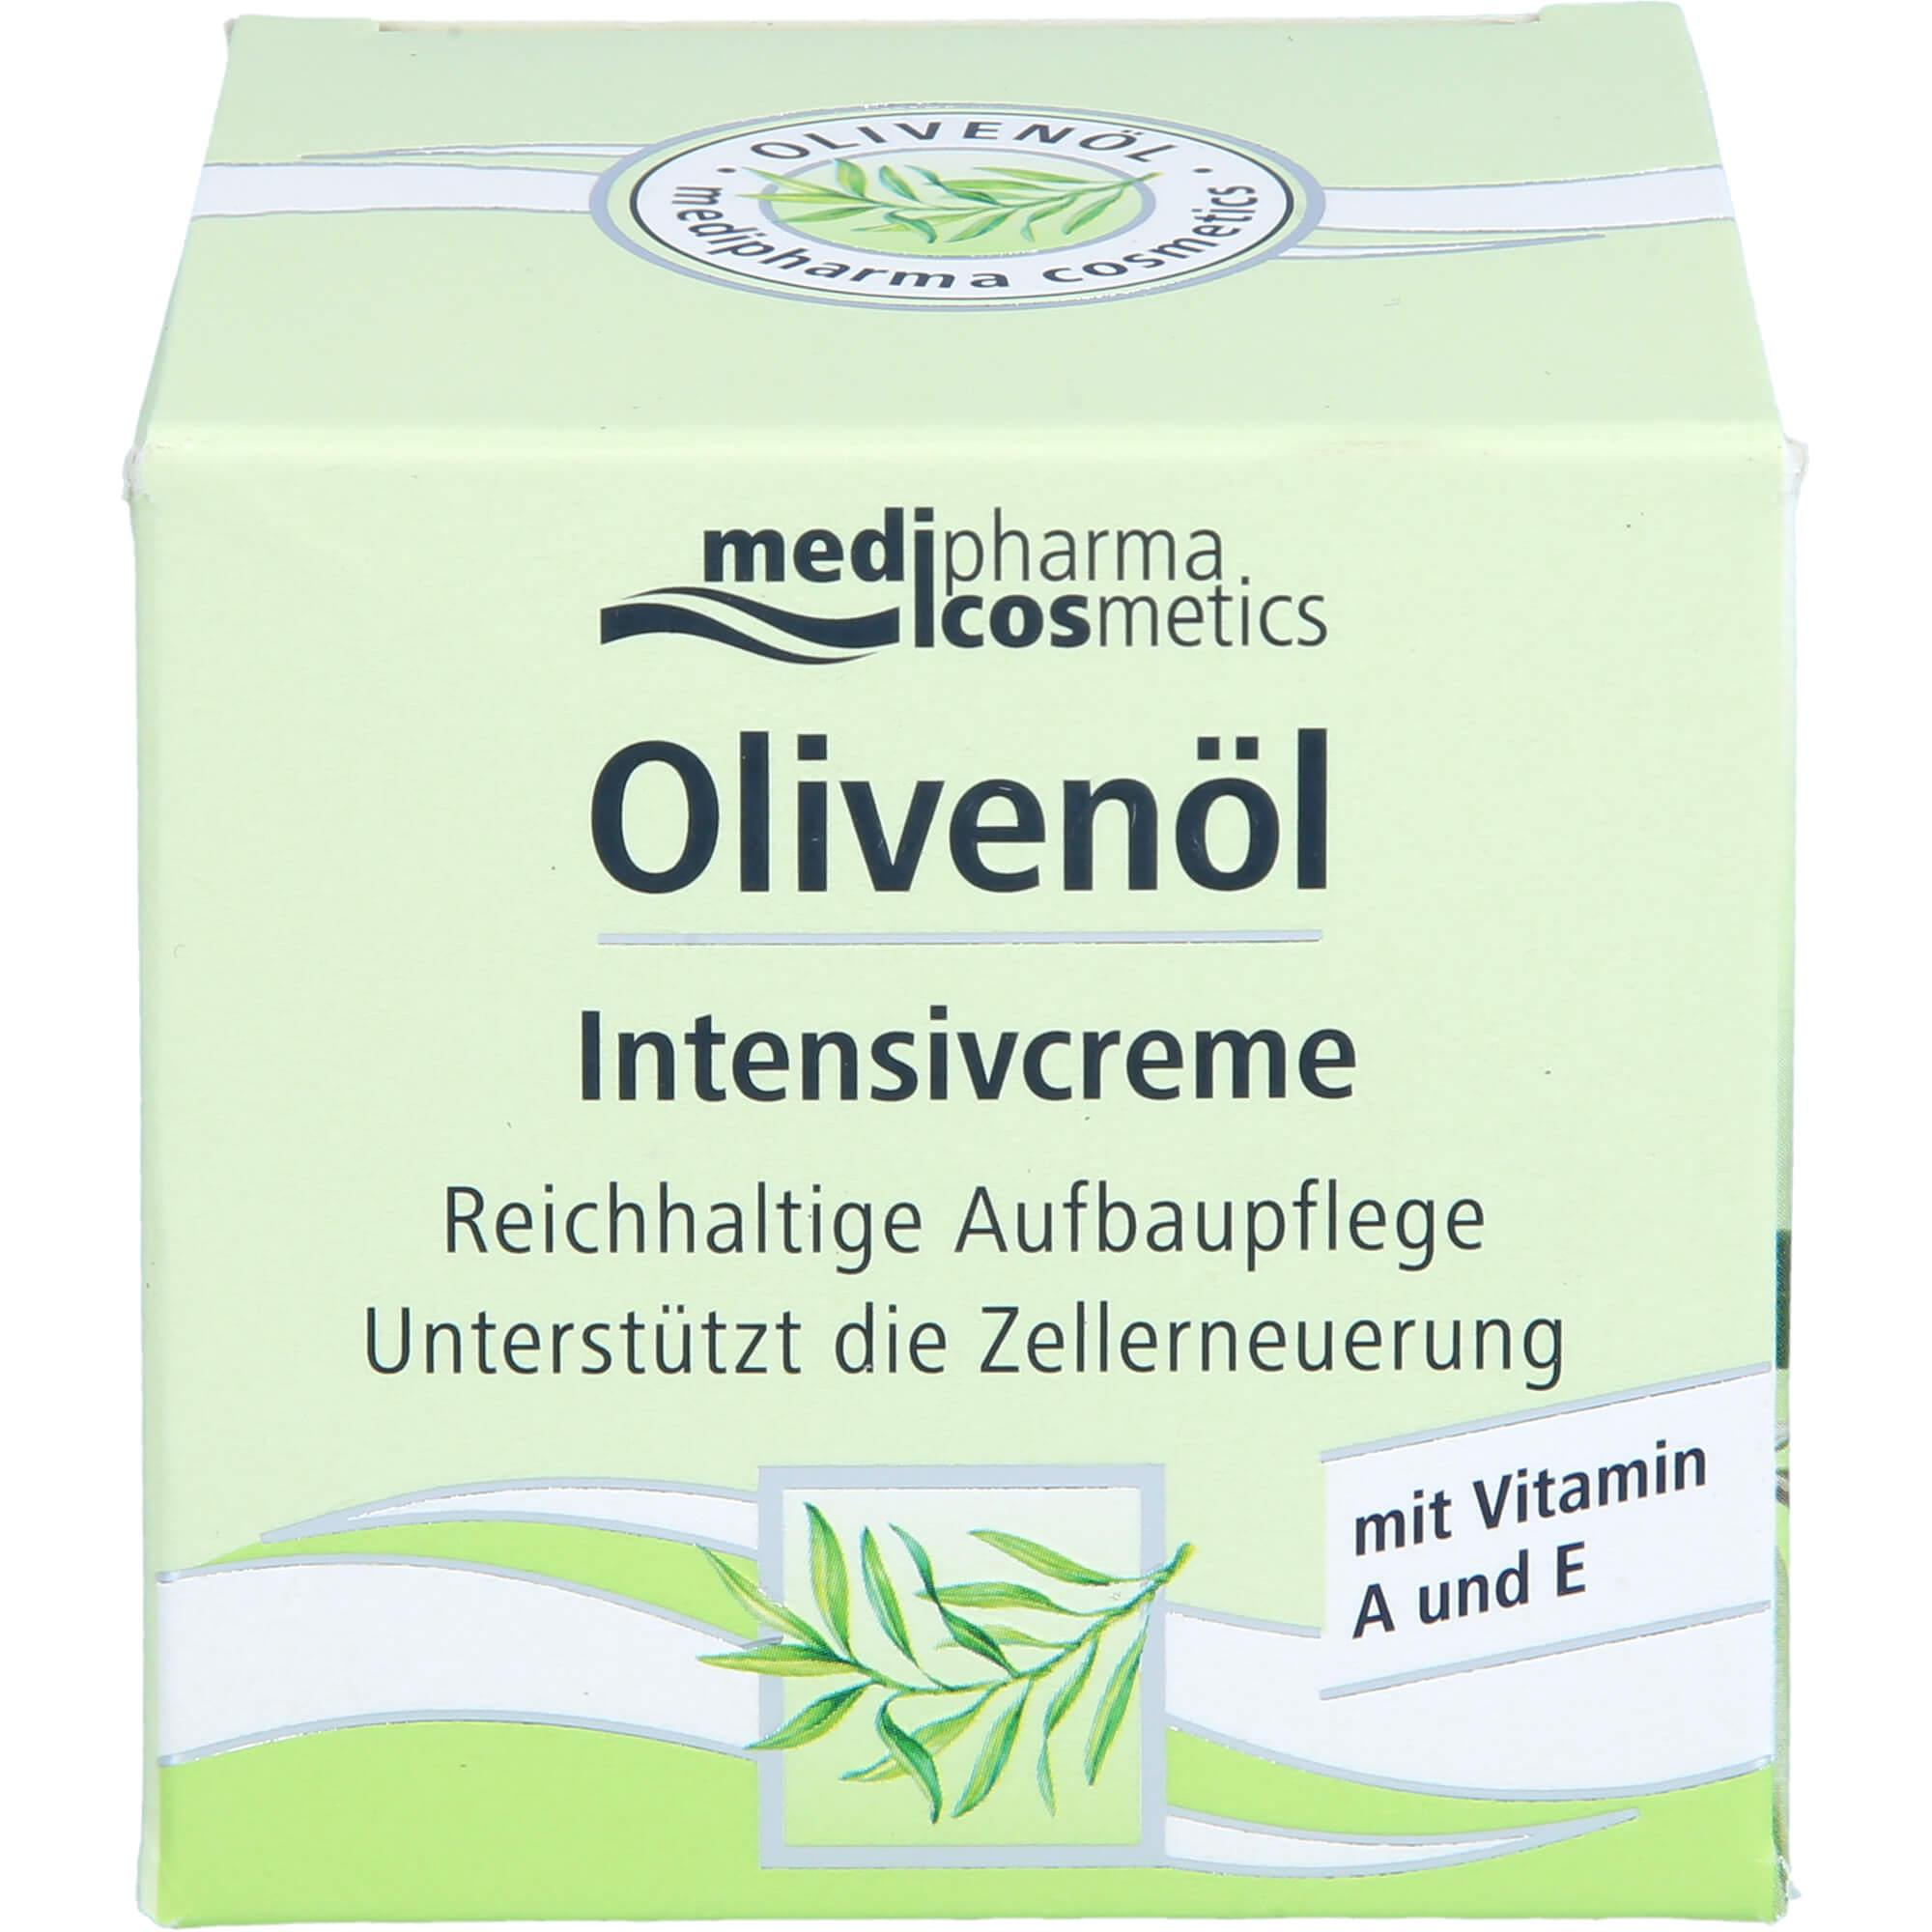 OLIVENOeL-INTENSIVCREME